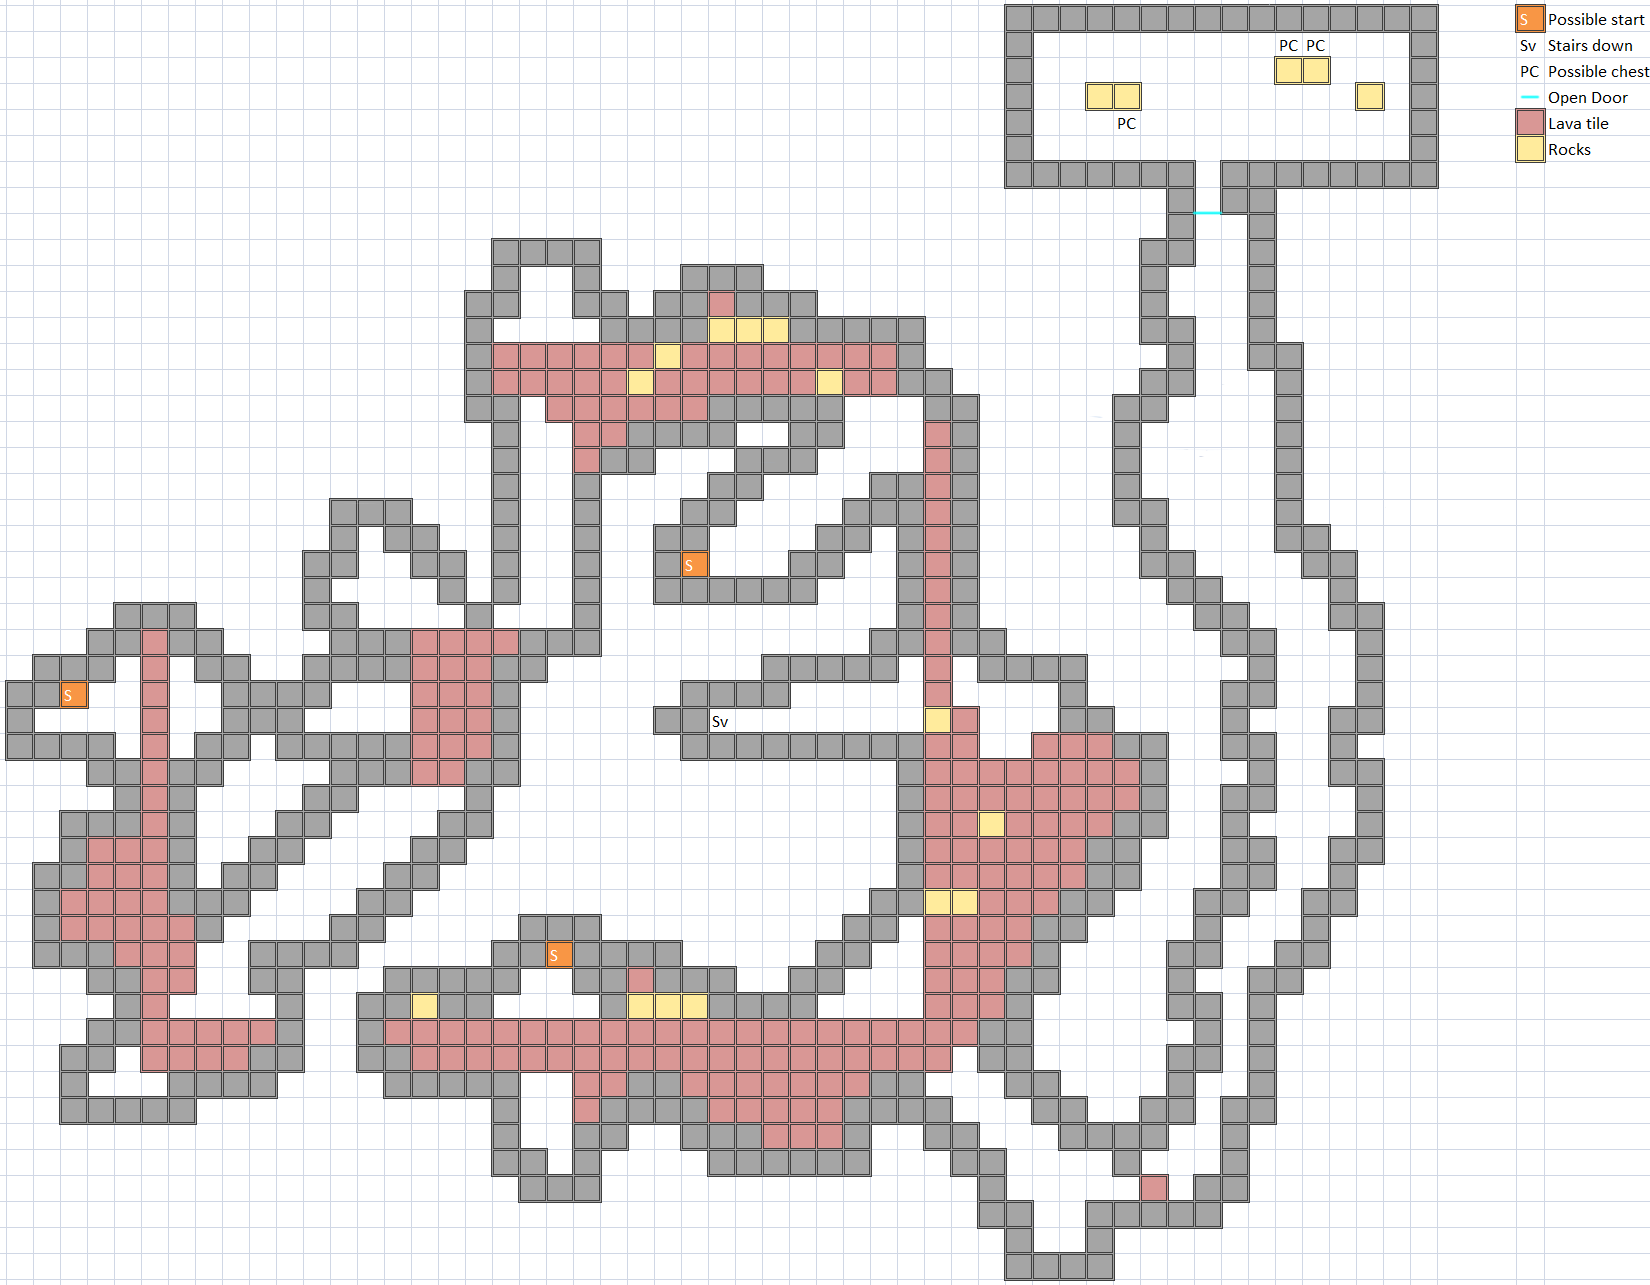 Zigzag Lavaway Map